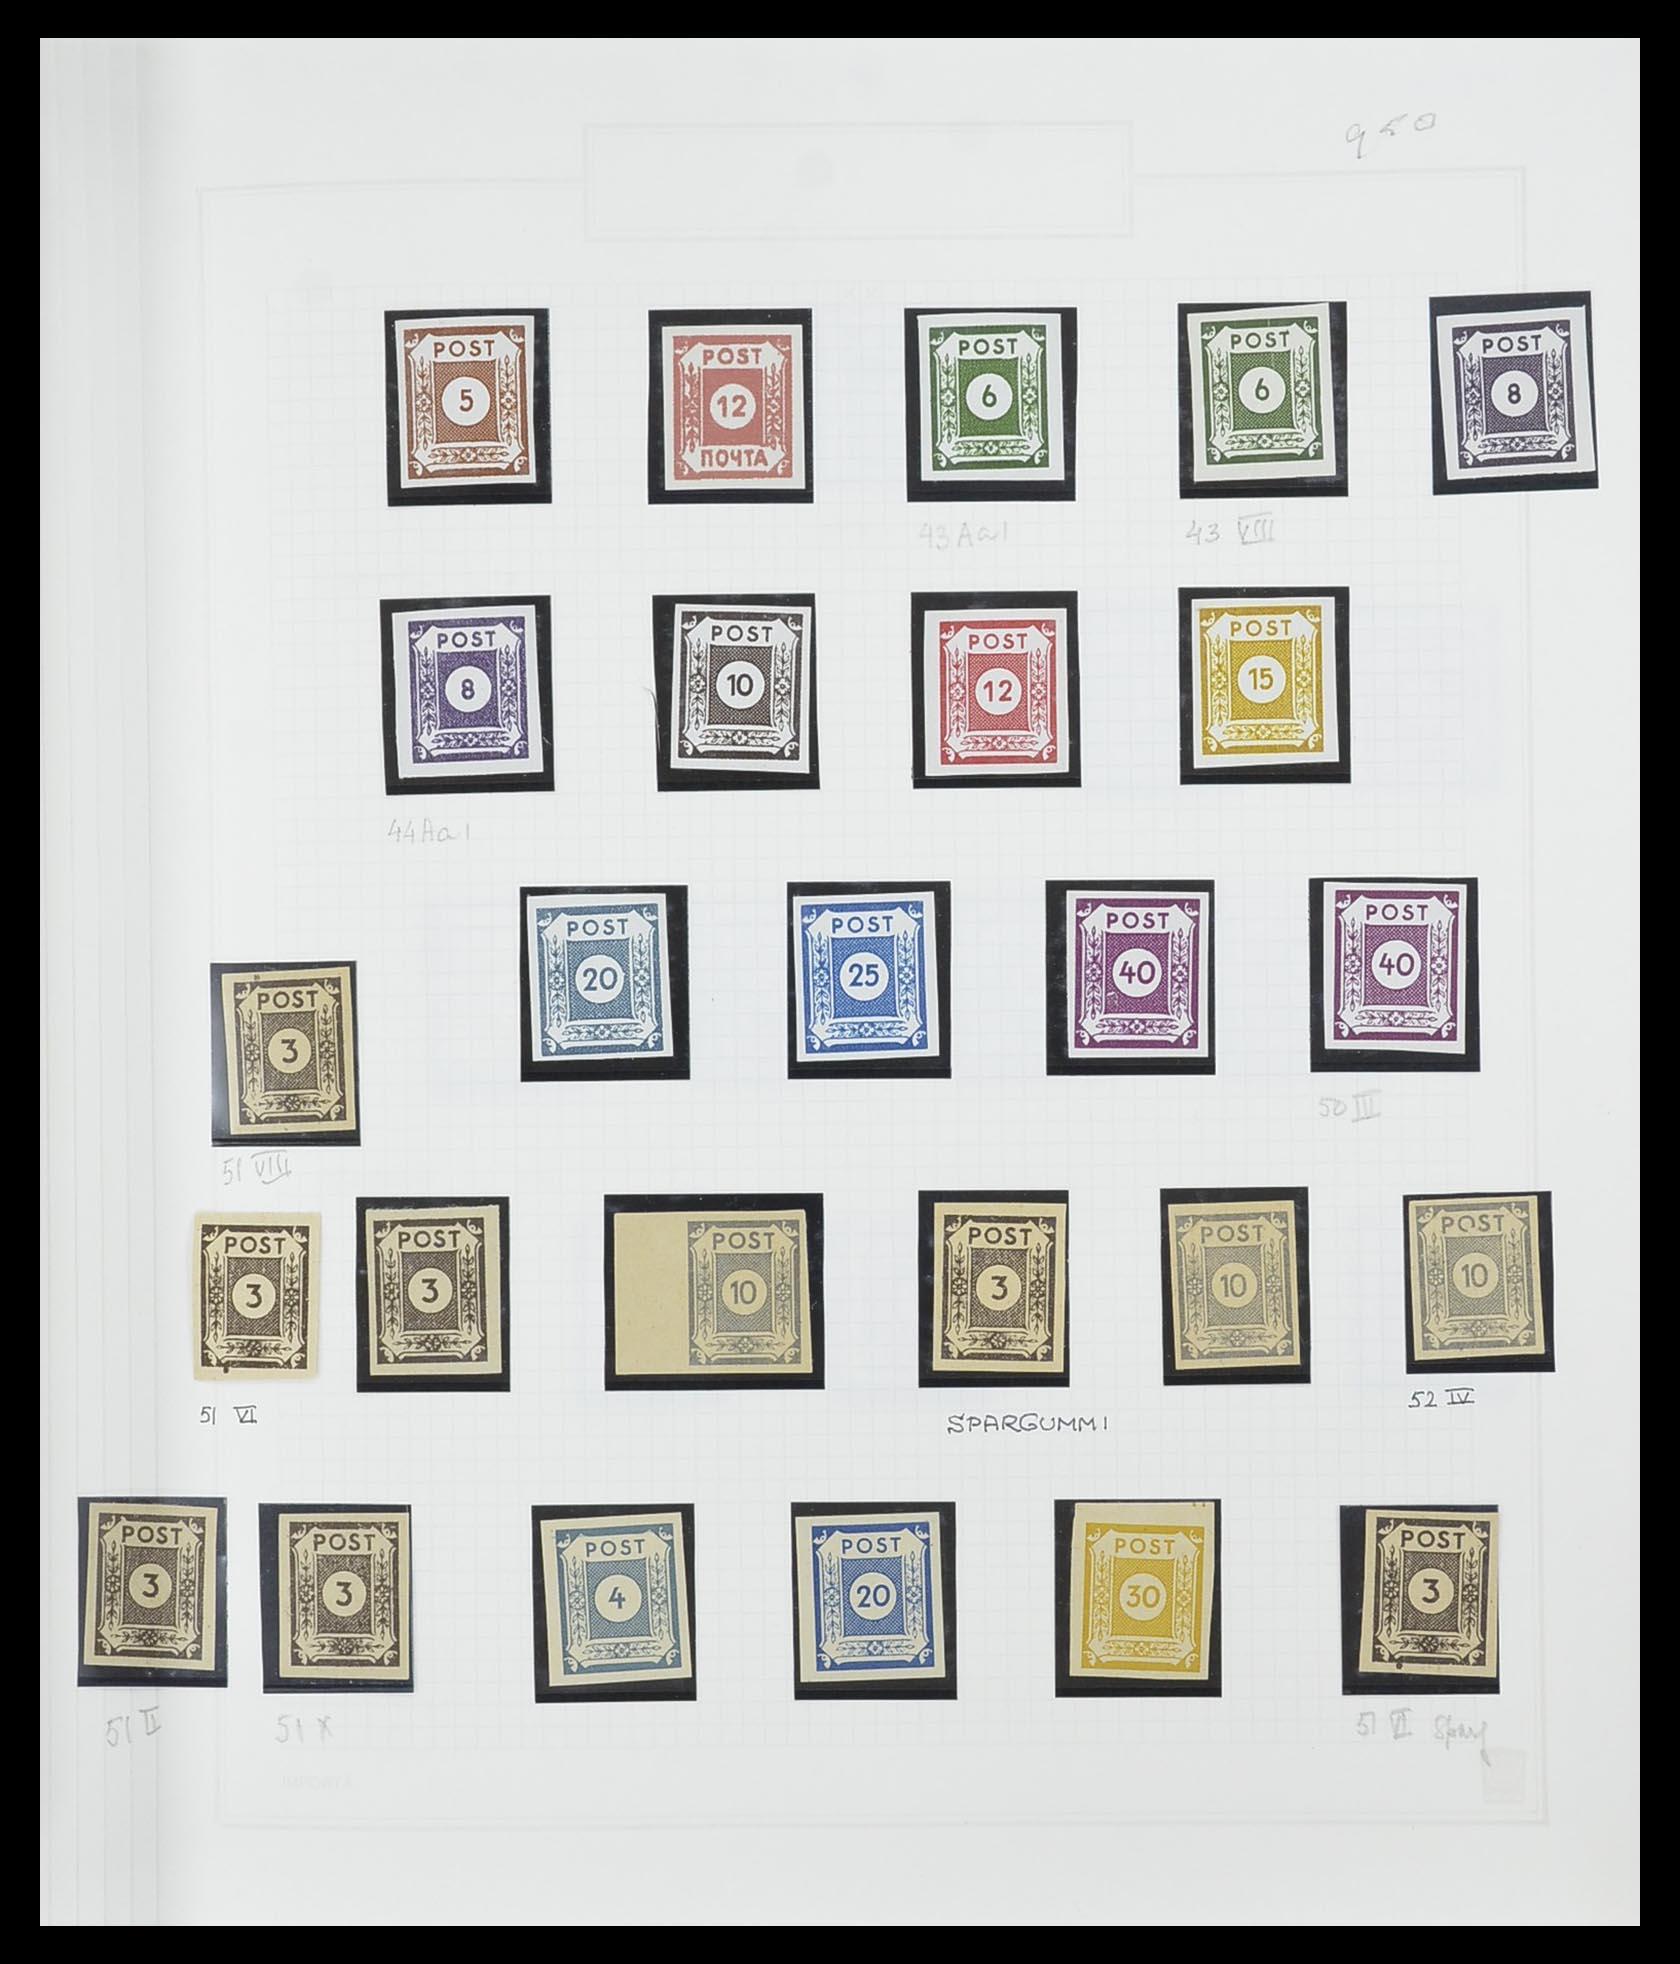 33698 016 - Postzegelverzameling 33698 Sovjet Zone 1945-1948.